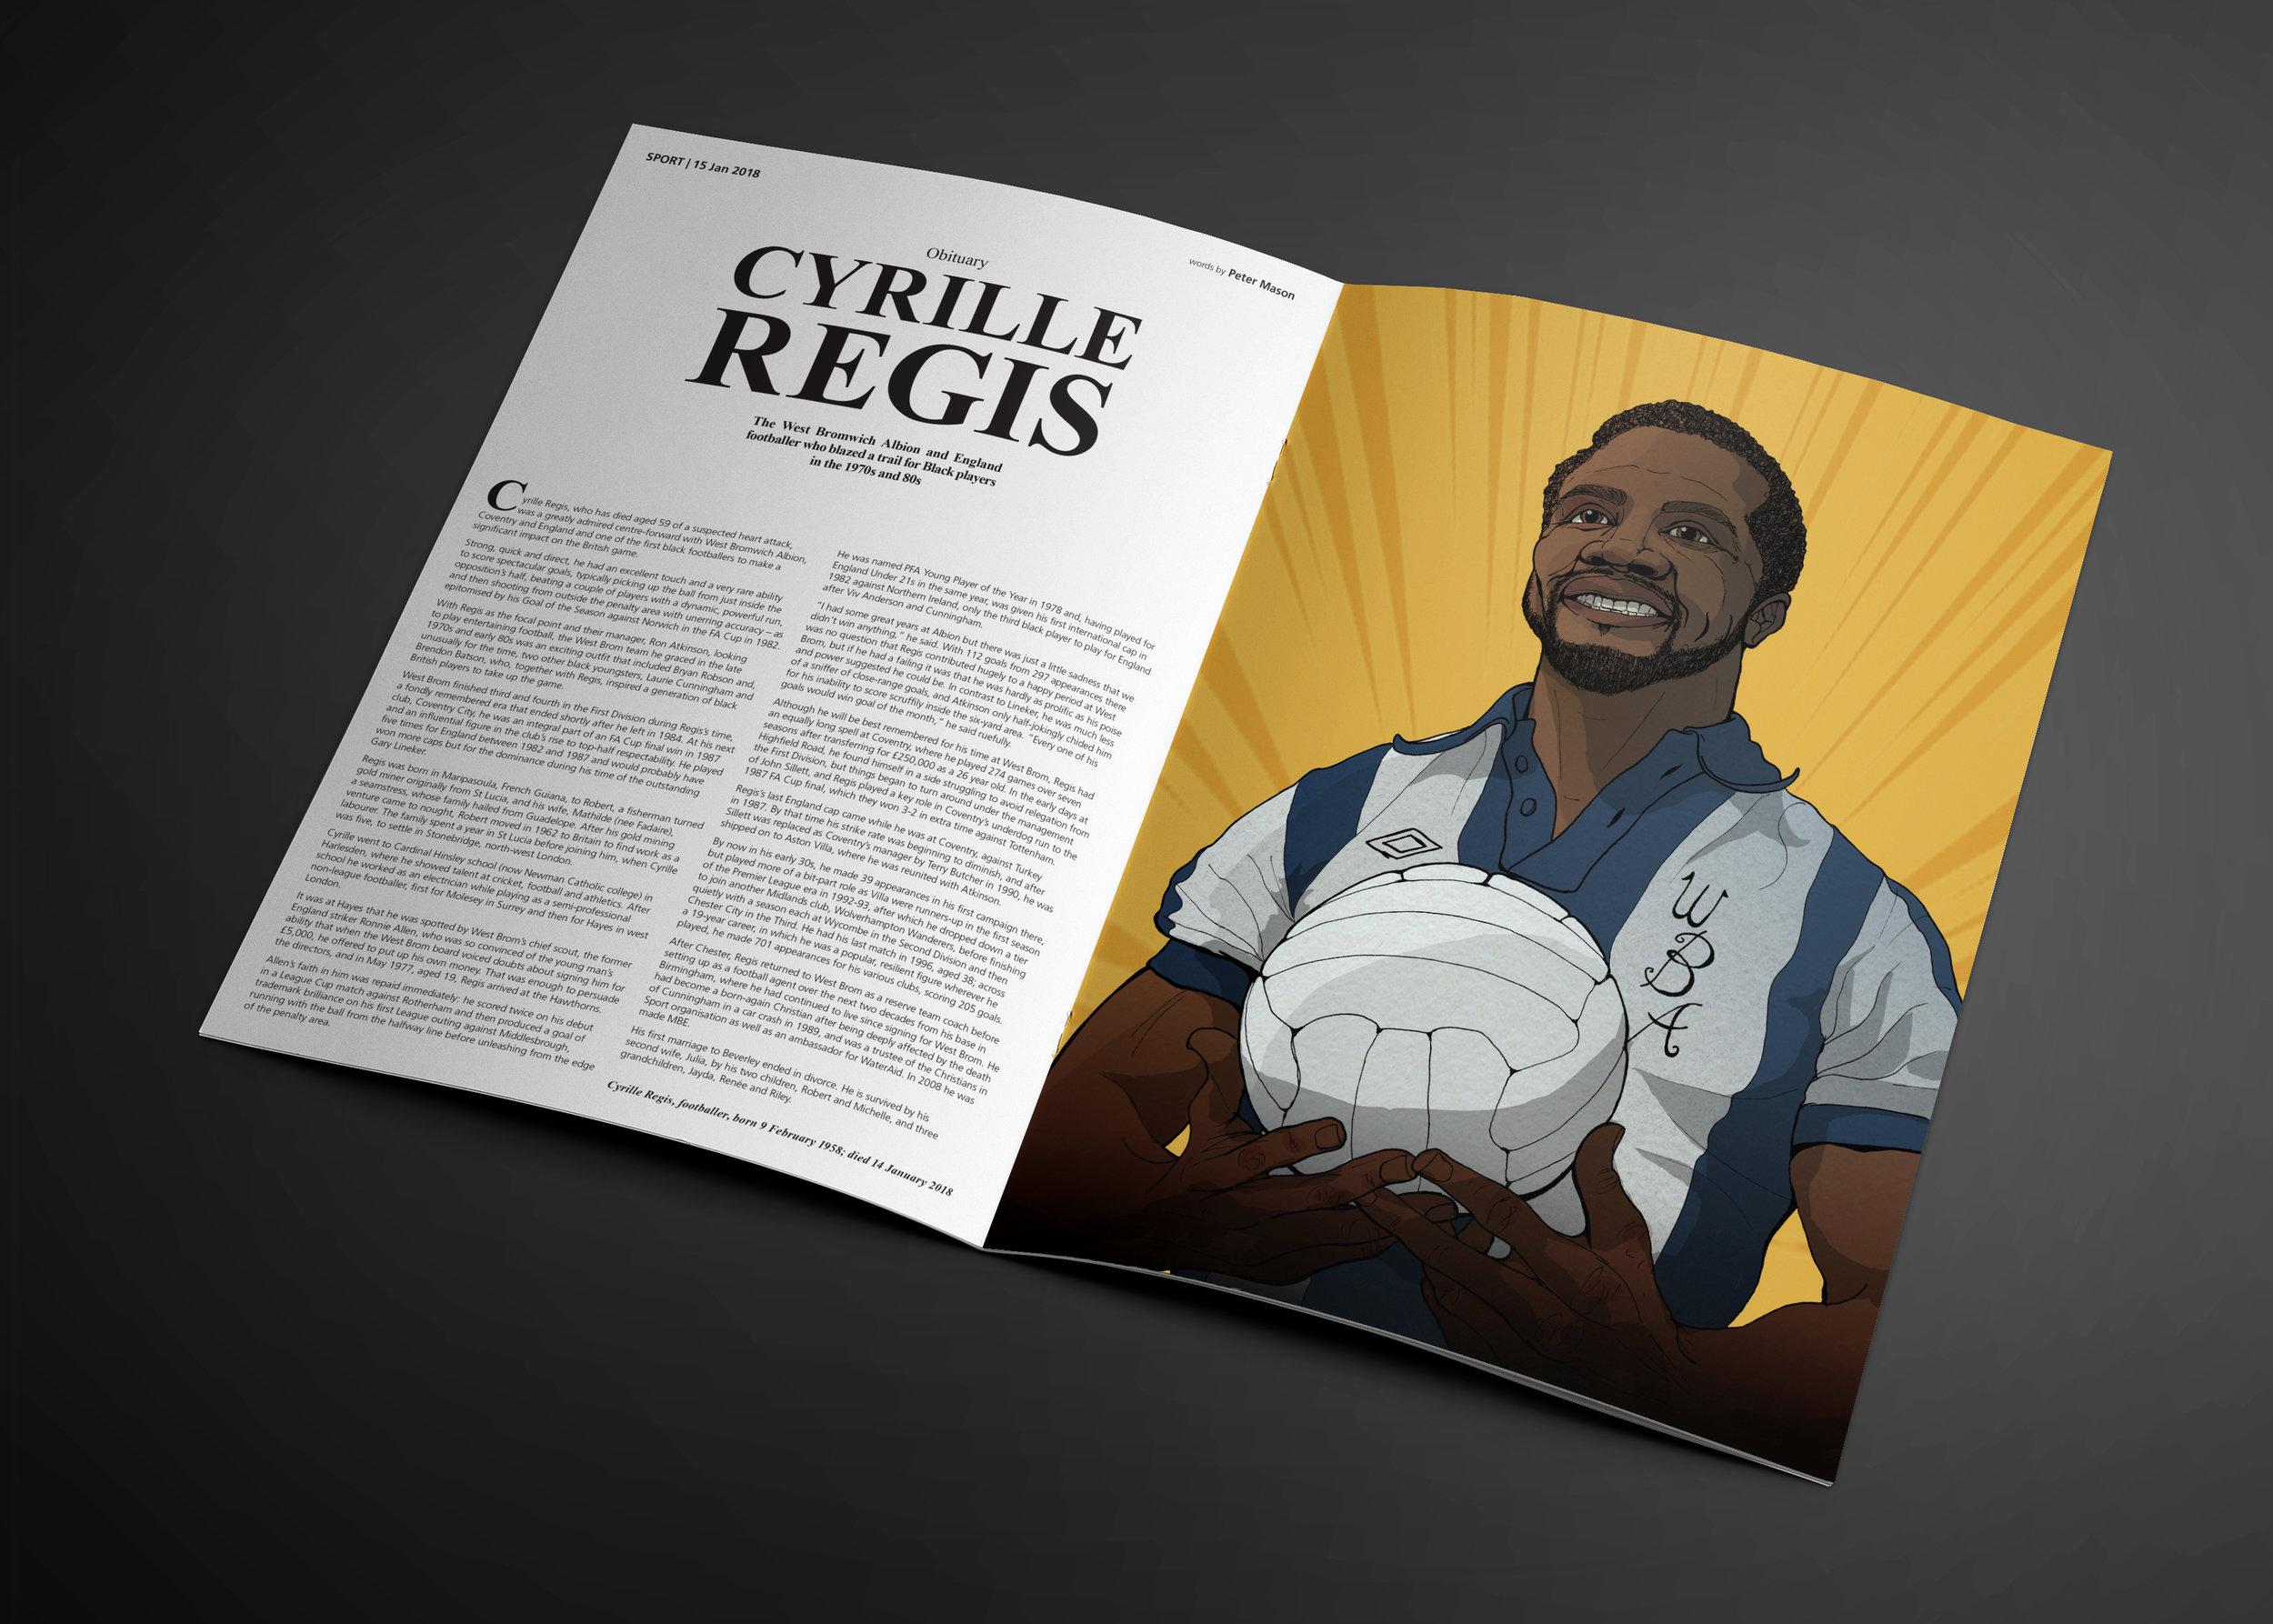 cyrille regis Magazine pages.jpg